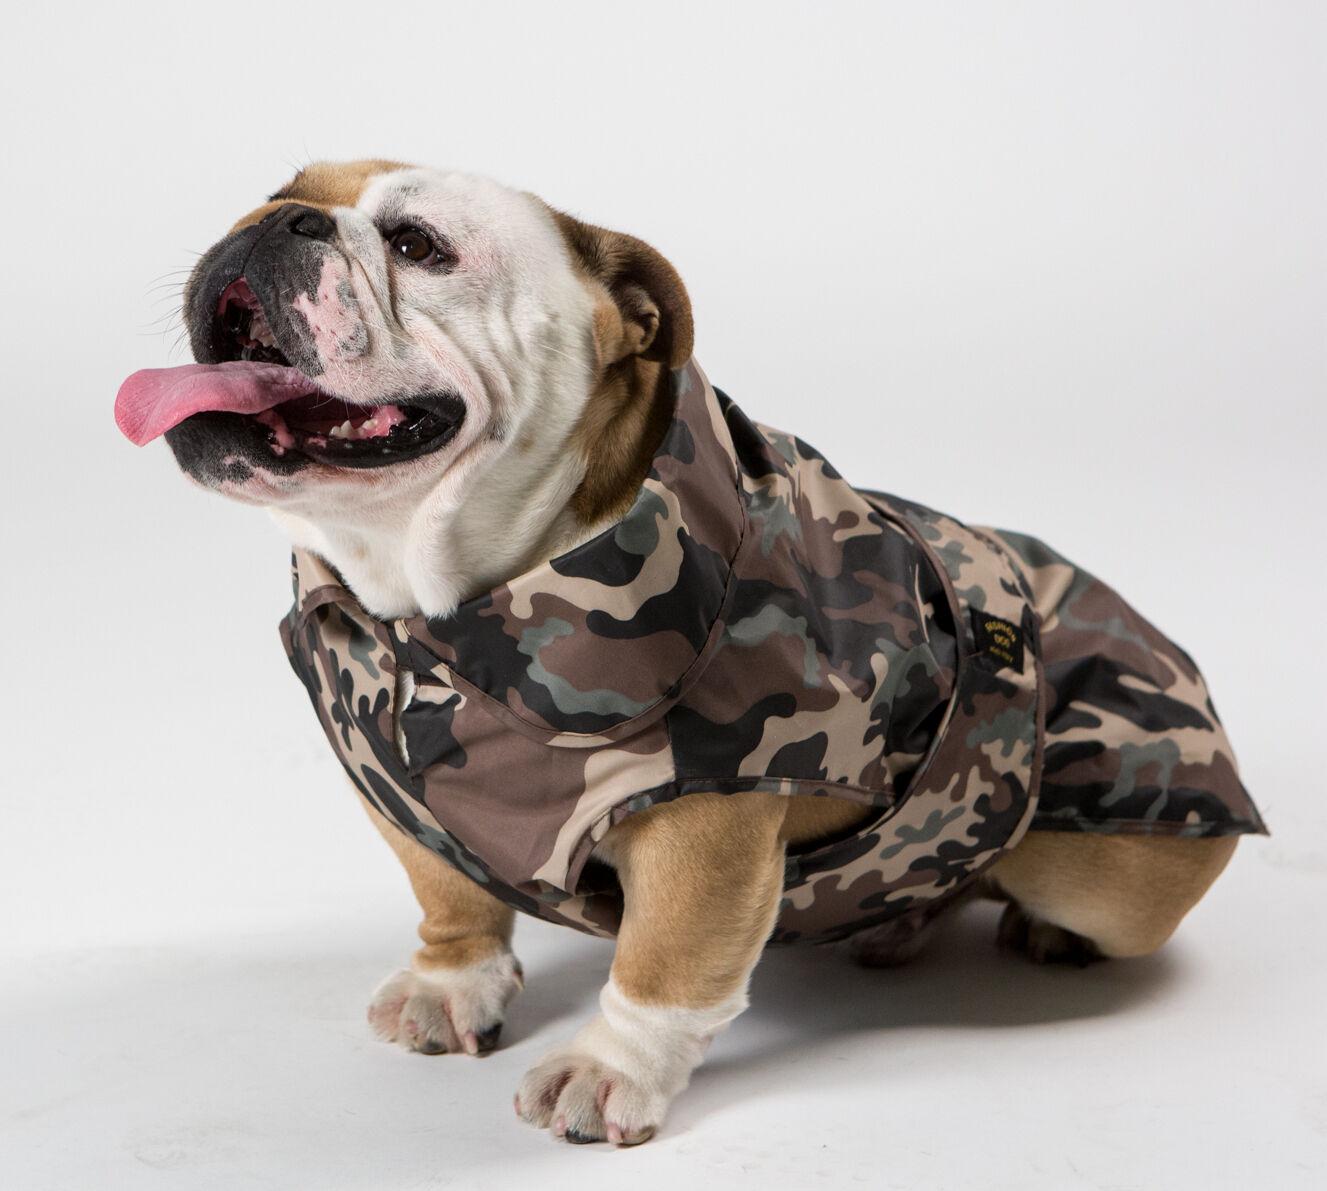 IMPERMEABILE MIMETICO PER BULLDOG INGLESE FASHION DOG MADE IN ITALY